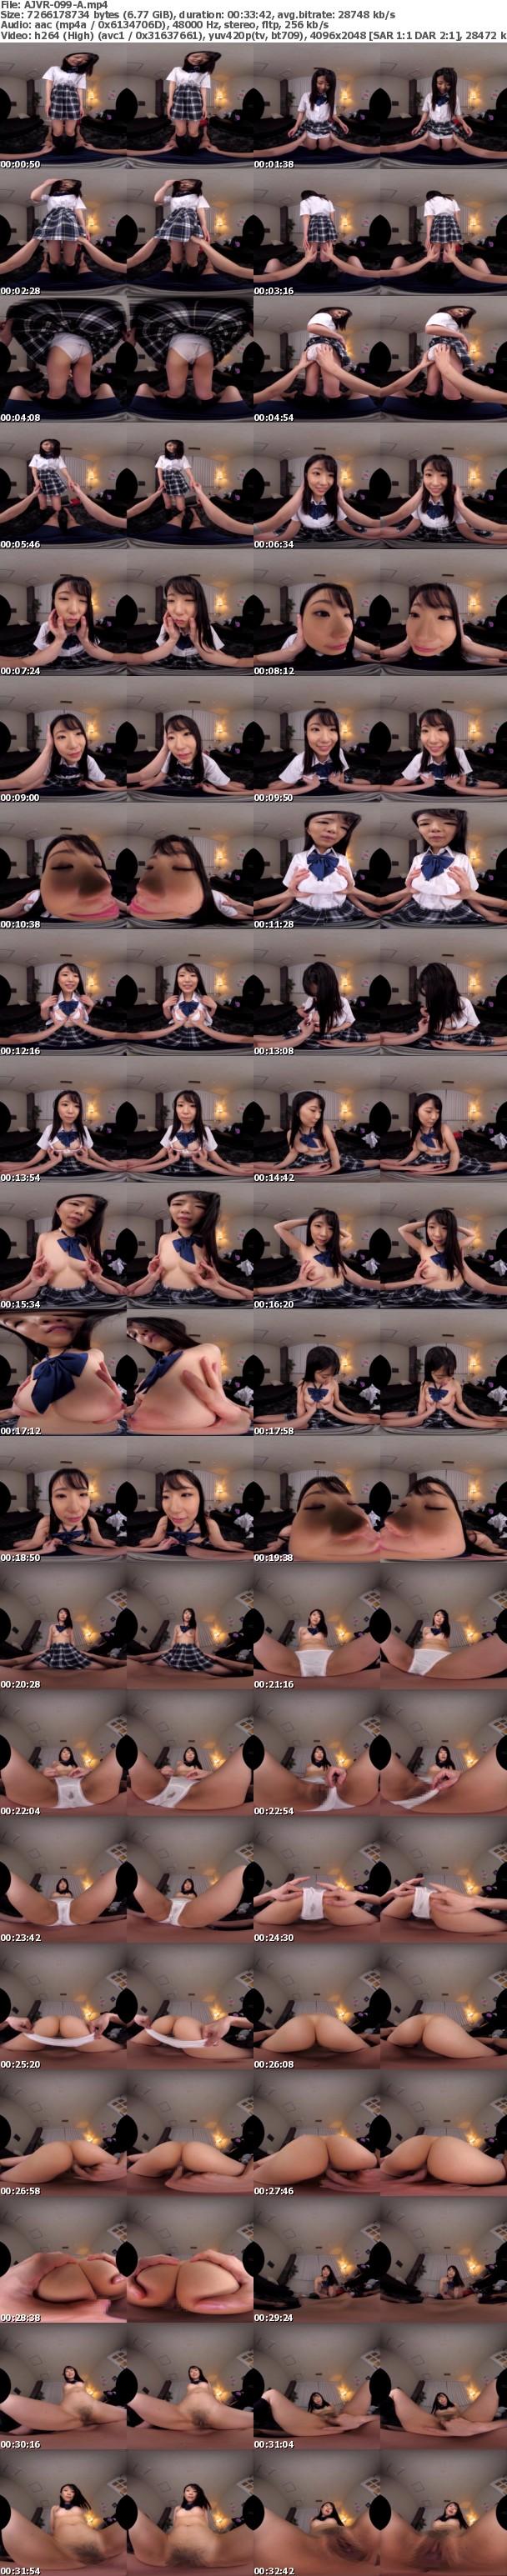 (VR) AJVR-099 頼んだらツバ3回飲ませてくれたワリキリ制服少女ゆいちゃん【ゴ有】超接近する薄ピンク乳輪&アナルと顔ハミ出さない覆いかぶさりツバ垂らし騎乗位と接吻しまくり対面座位とデカ尻突きまくりバックとゴム外して【生ハメ】超・覆いかぶさり正常位【中出し】 河合ゆい